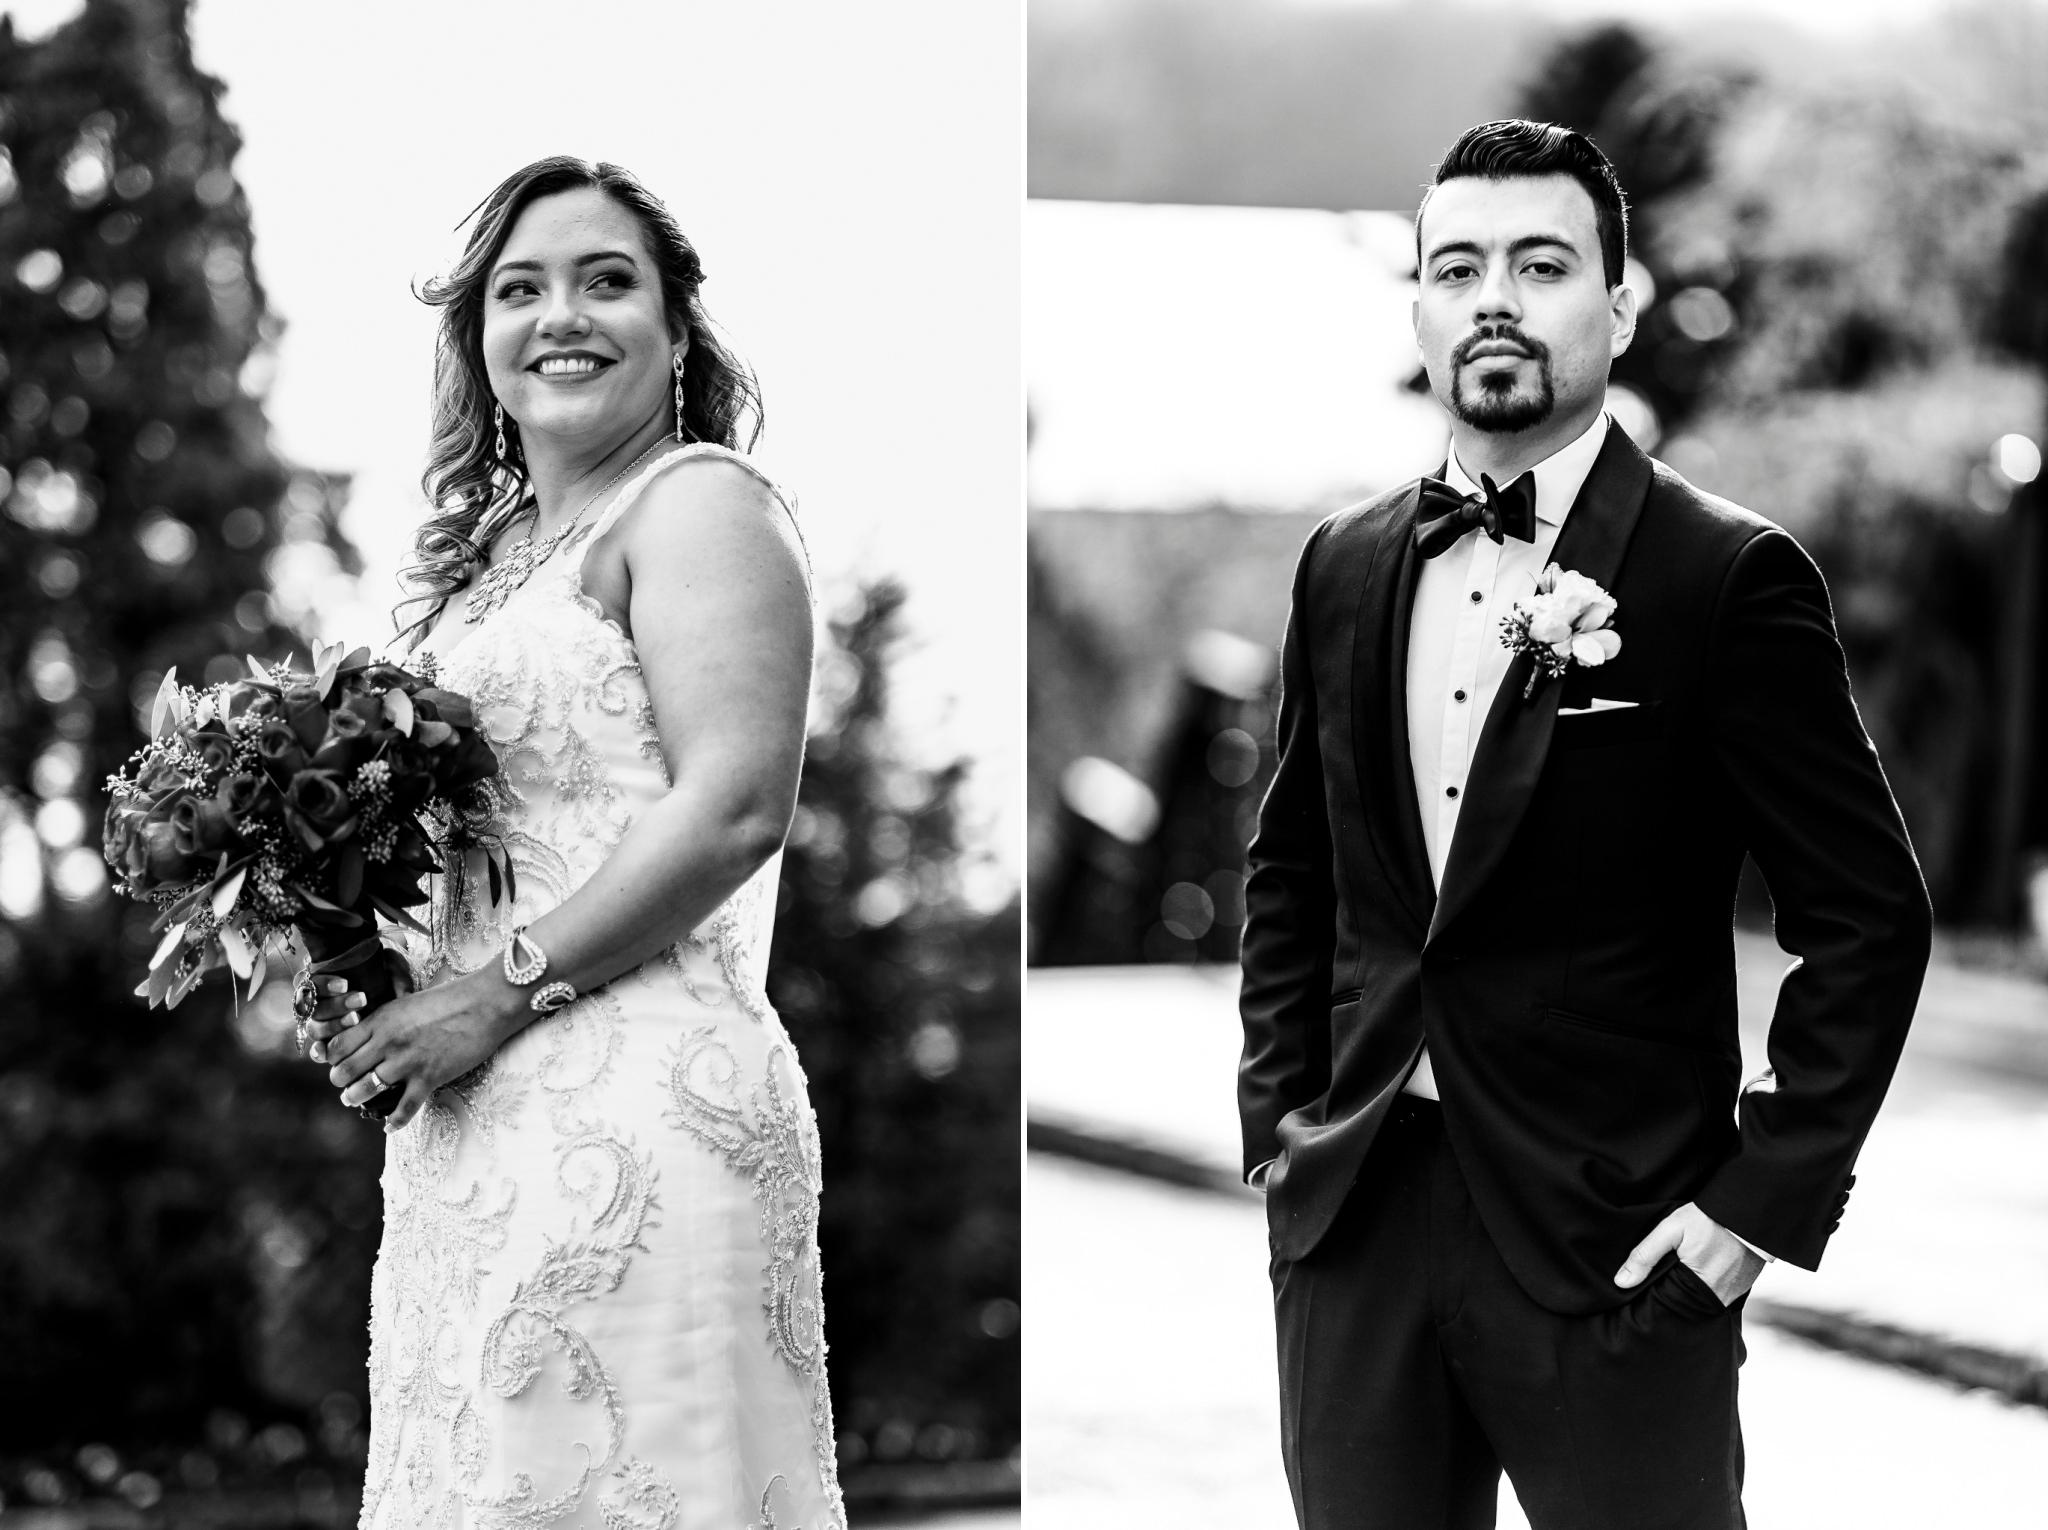 Sanchez-Leonards-Palazzo-New-York-Wedding-Photographer-54.JPG